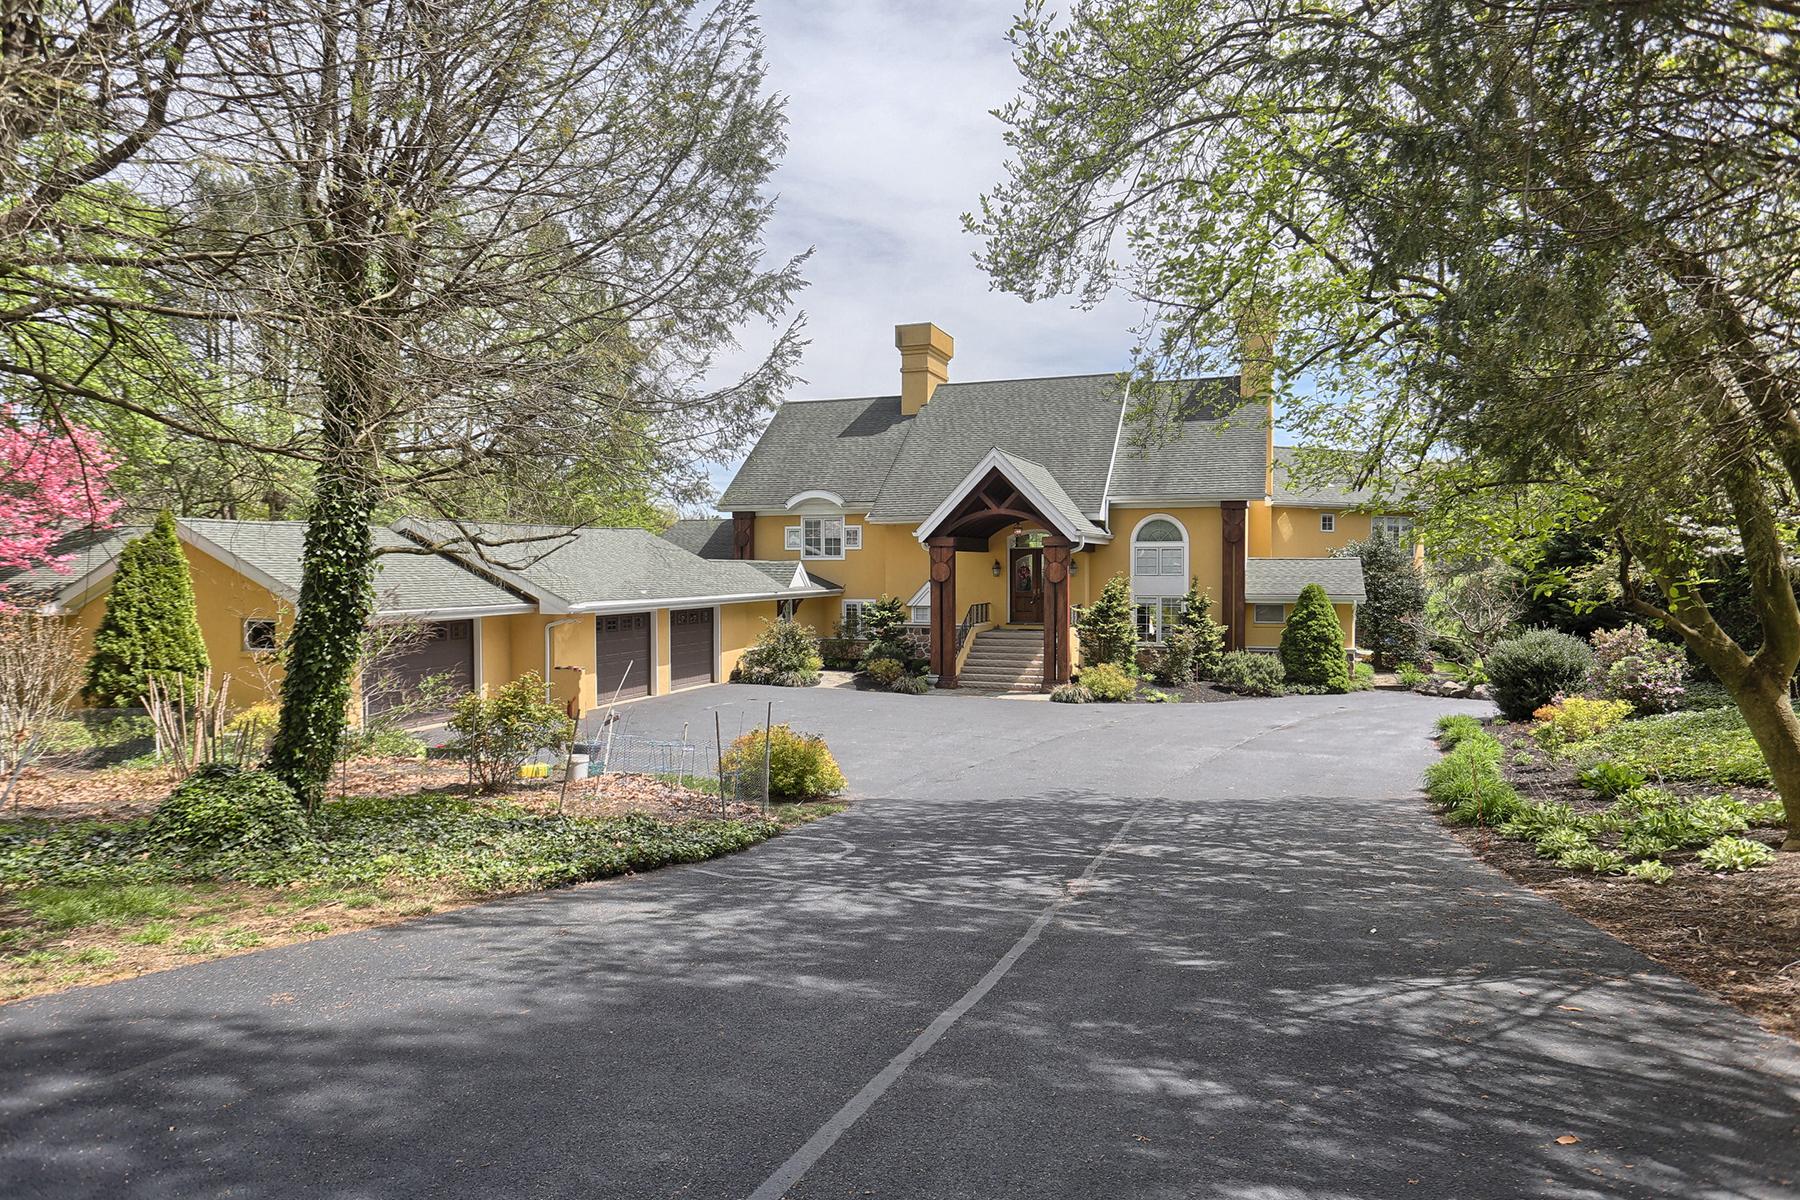 Single Family Home for Sale at 663 Oakwood Lane Lancaster, Pennsylvania 17603 United States